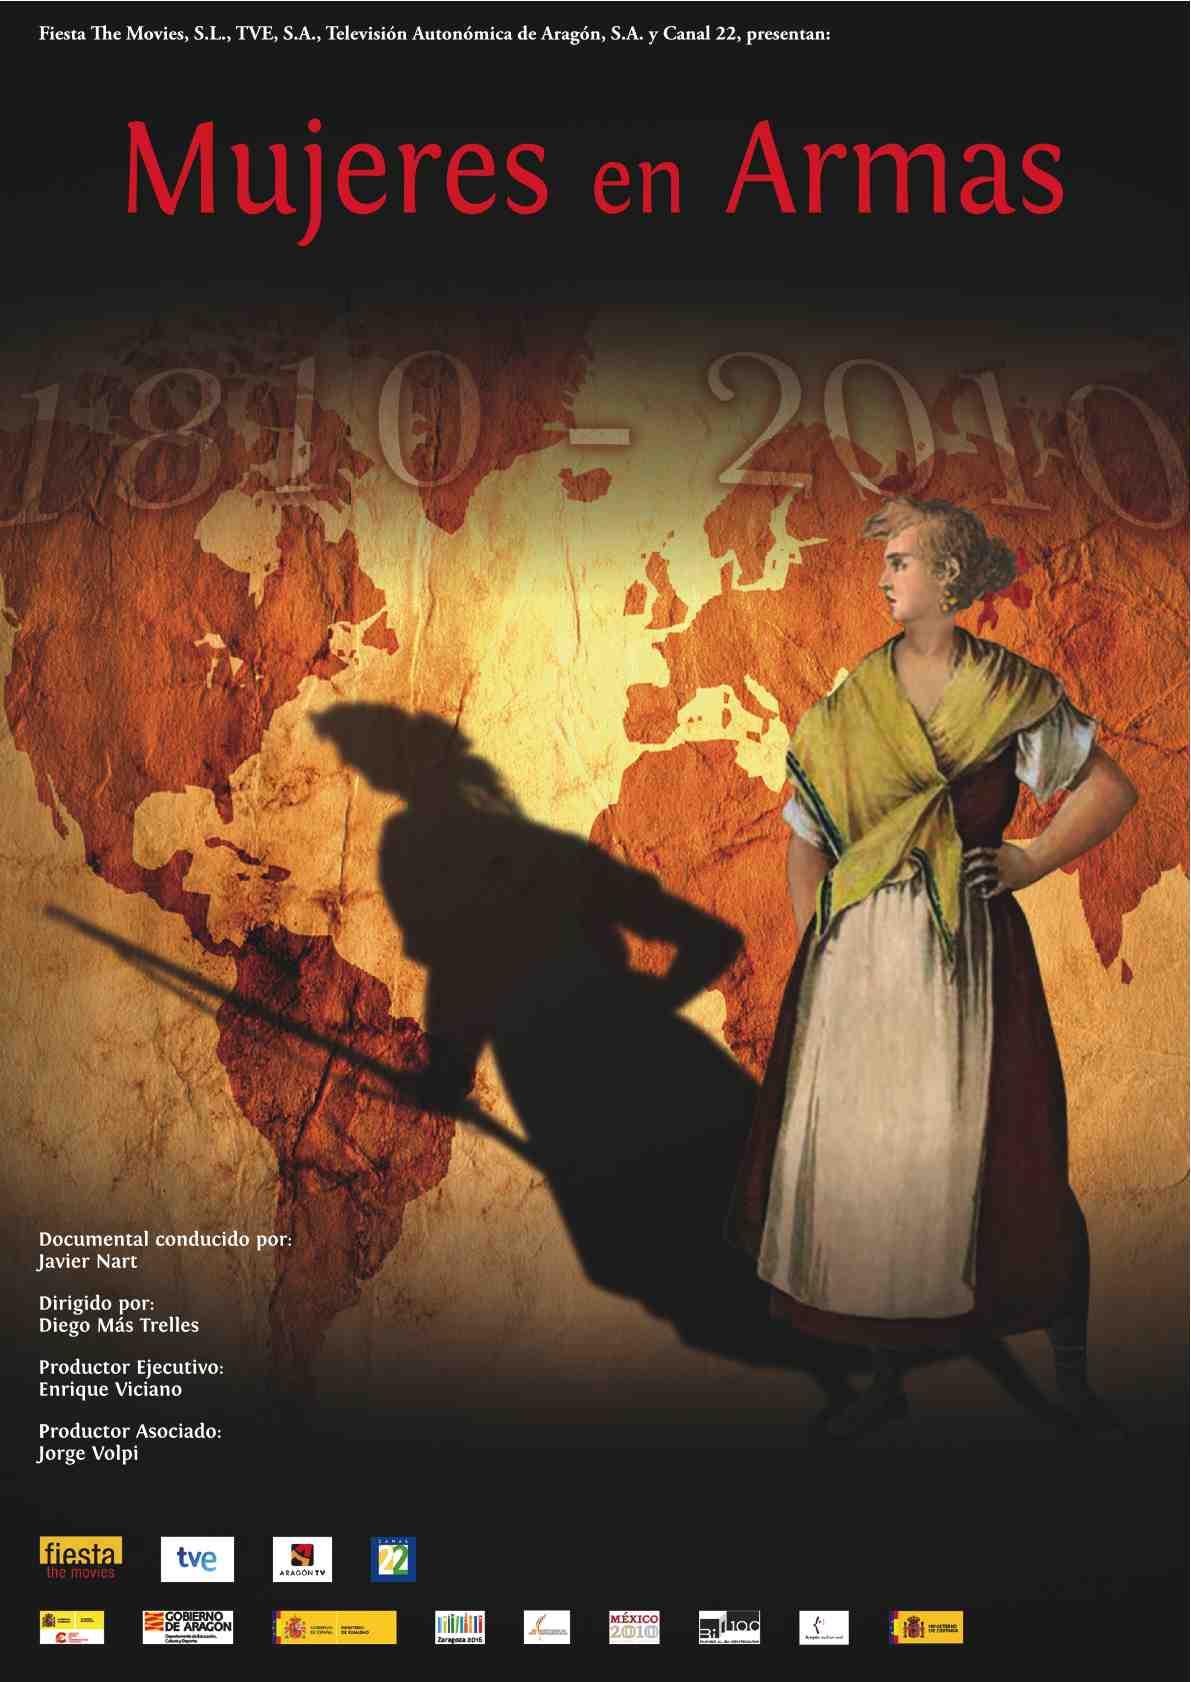 Mujeres en Armas (2010)